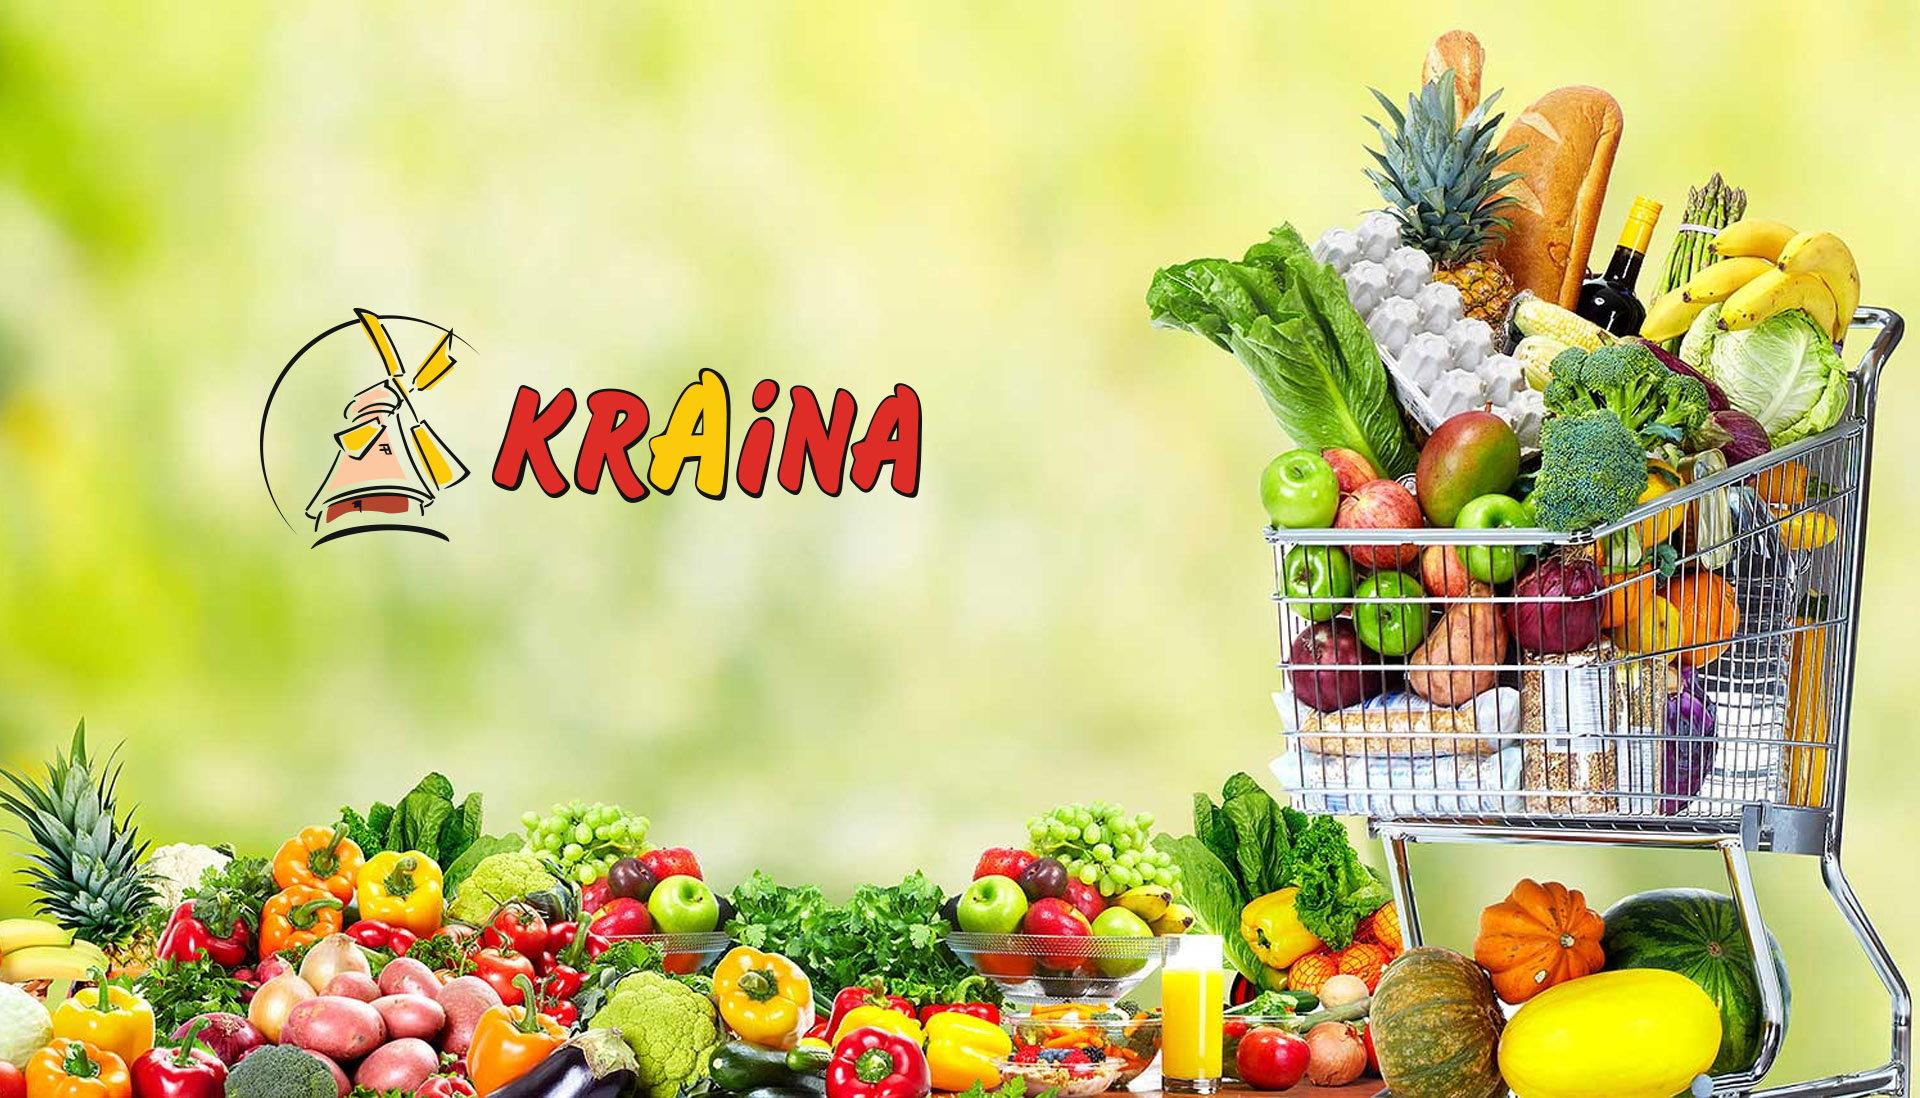 Дизайн логотипа супер-маркета, Supermarket logo design